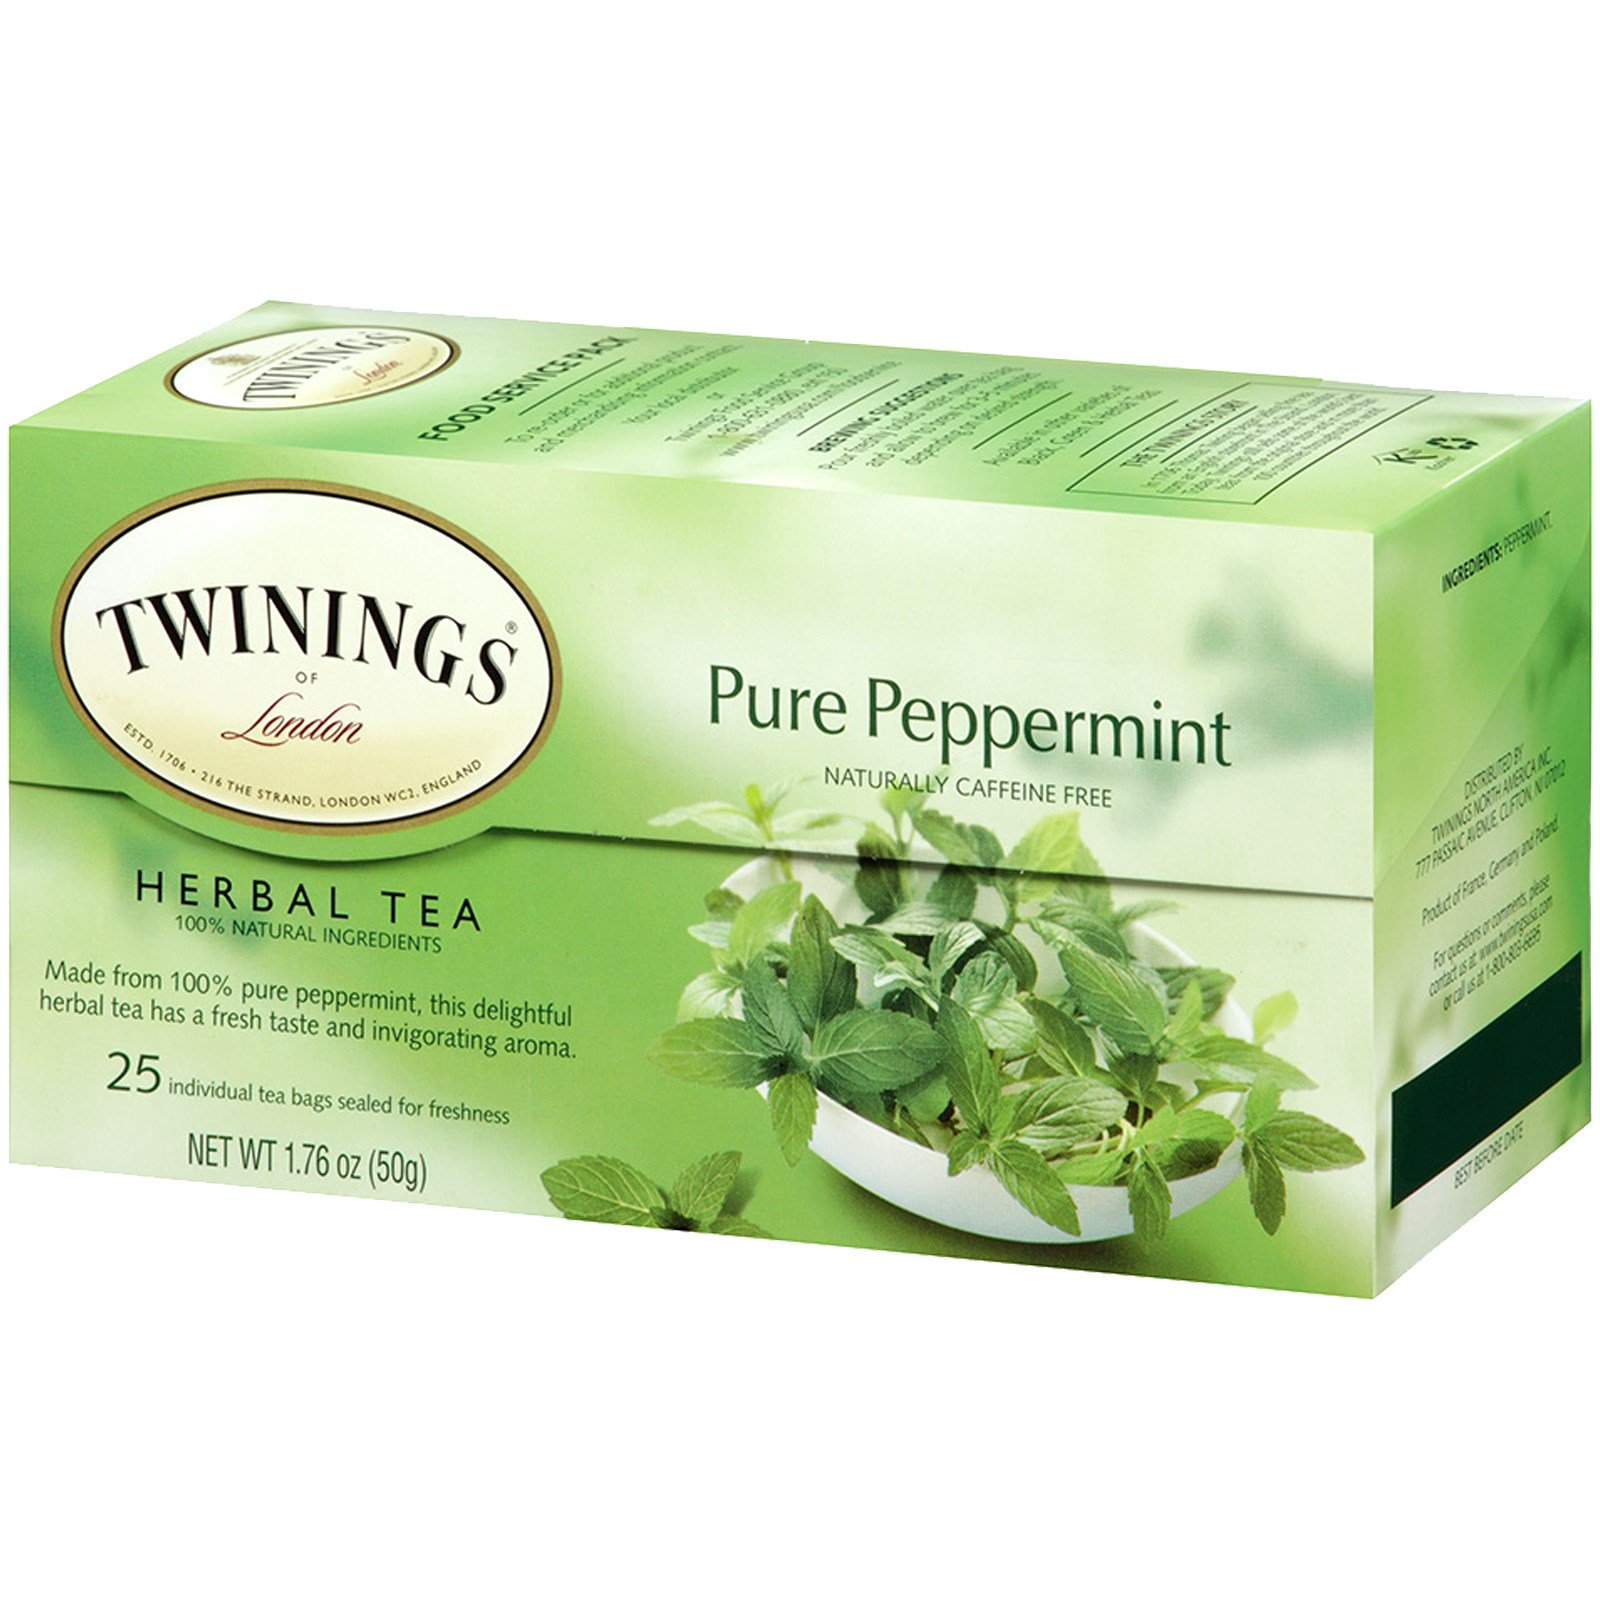 Twinings Herbal Tea Pure Peppermint Caffeine Free 25 Bags 1 76